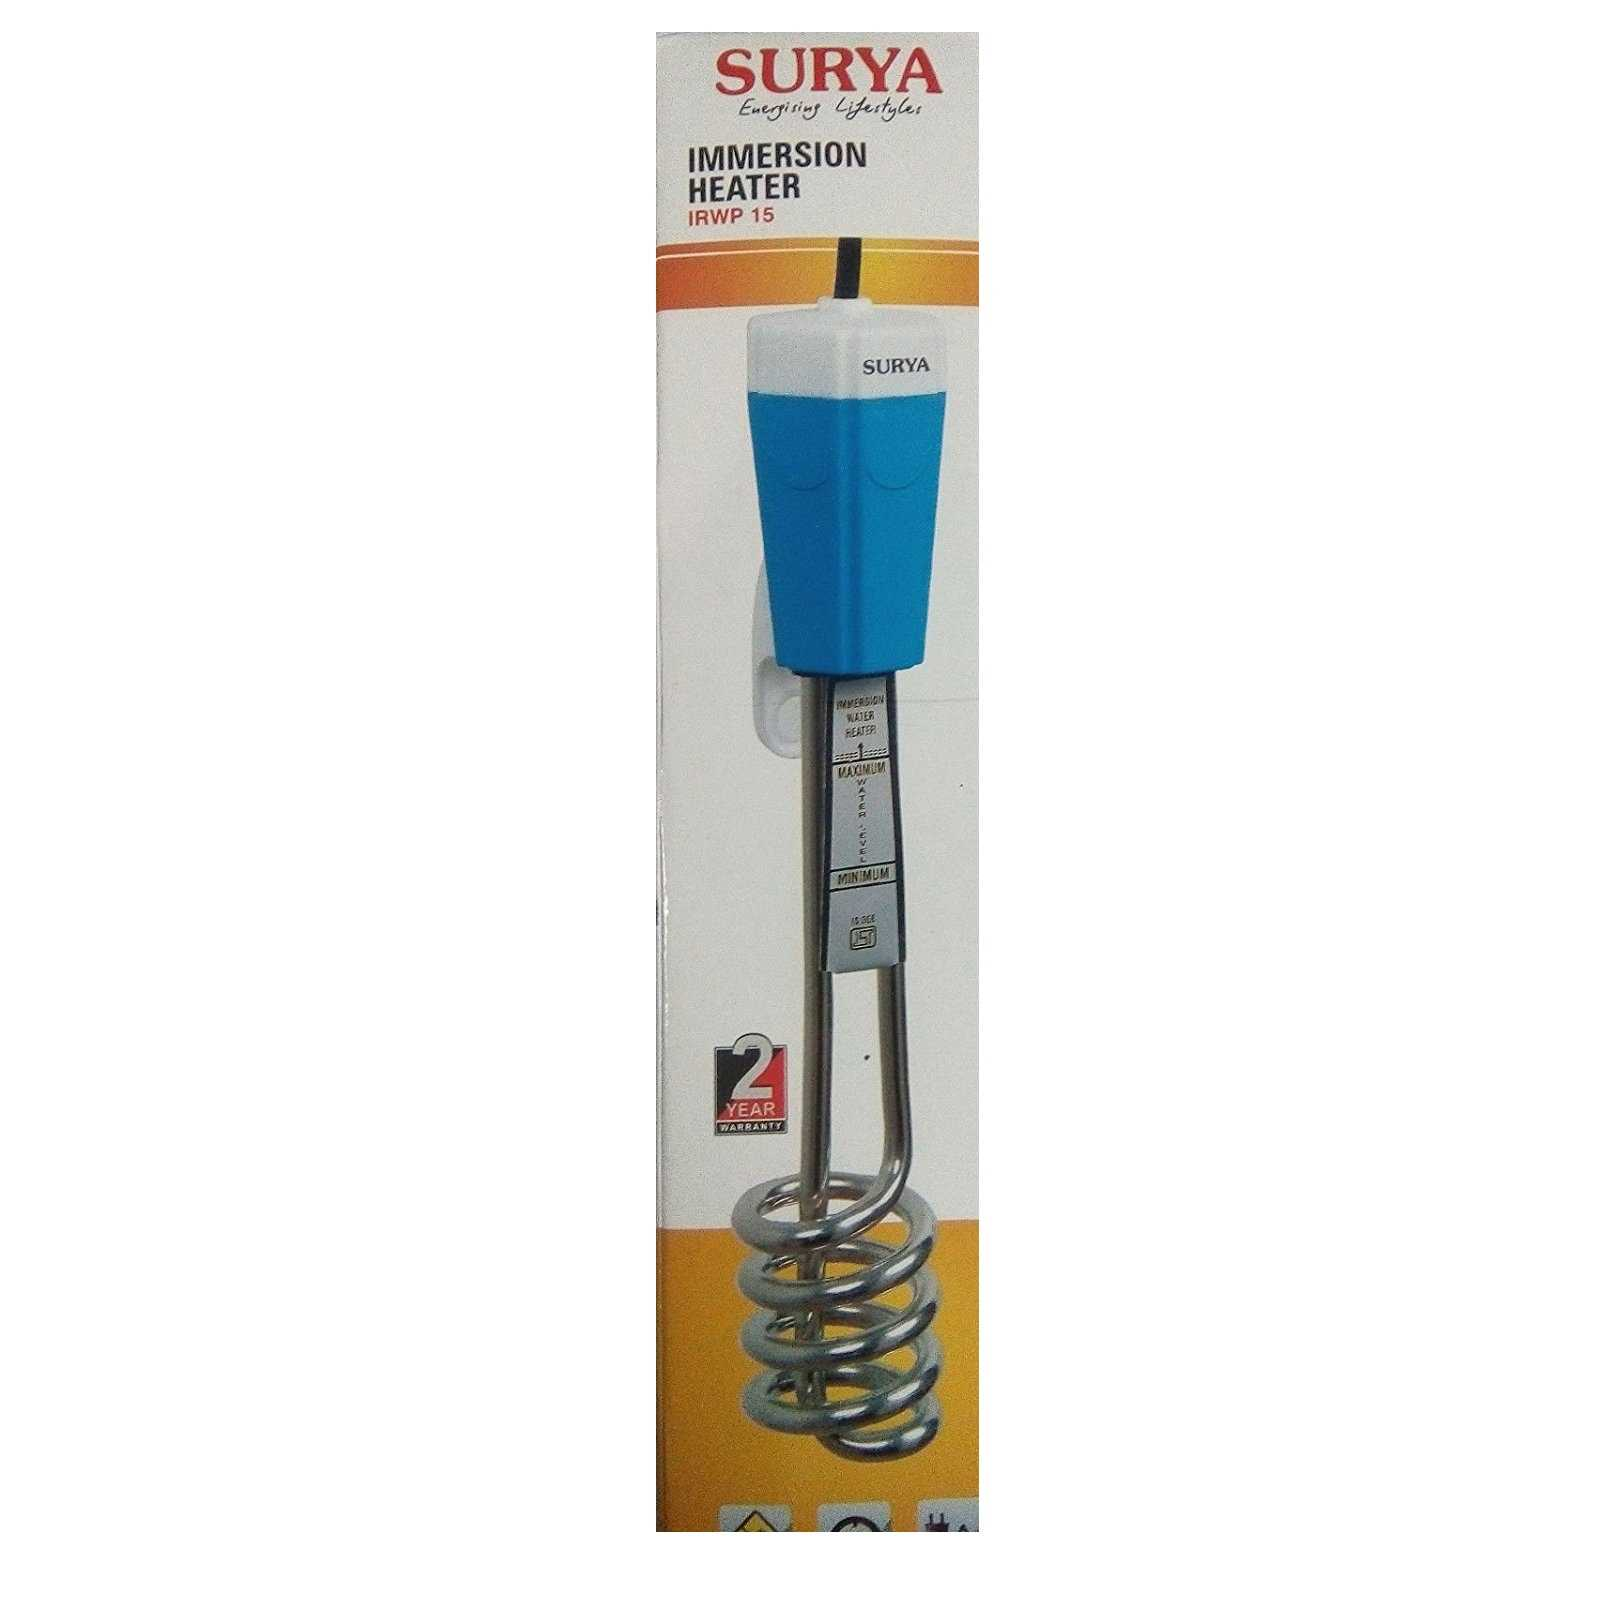 Surya IRWP-15 Electric Immersion Rod